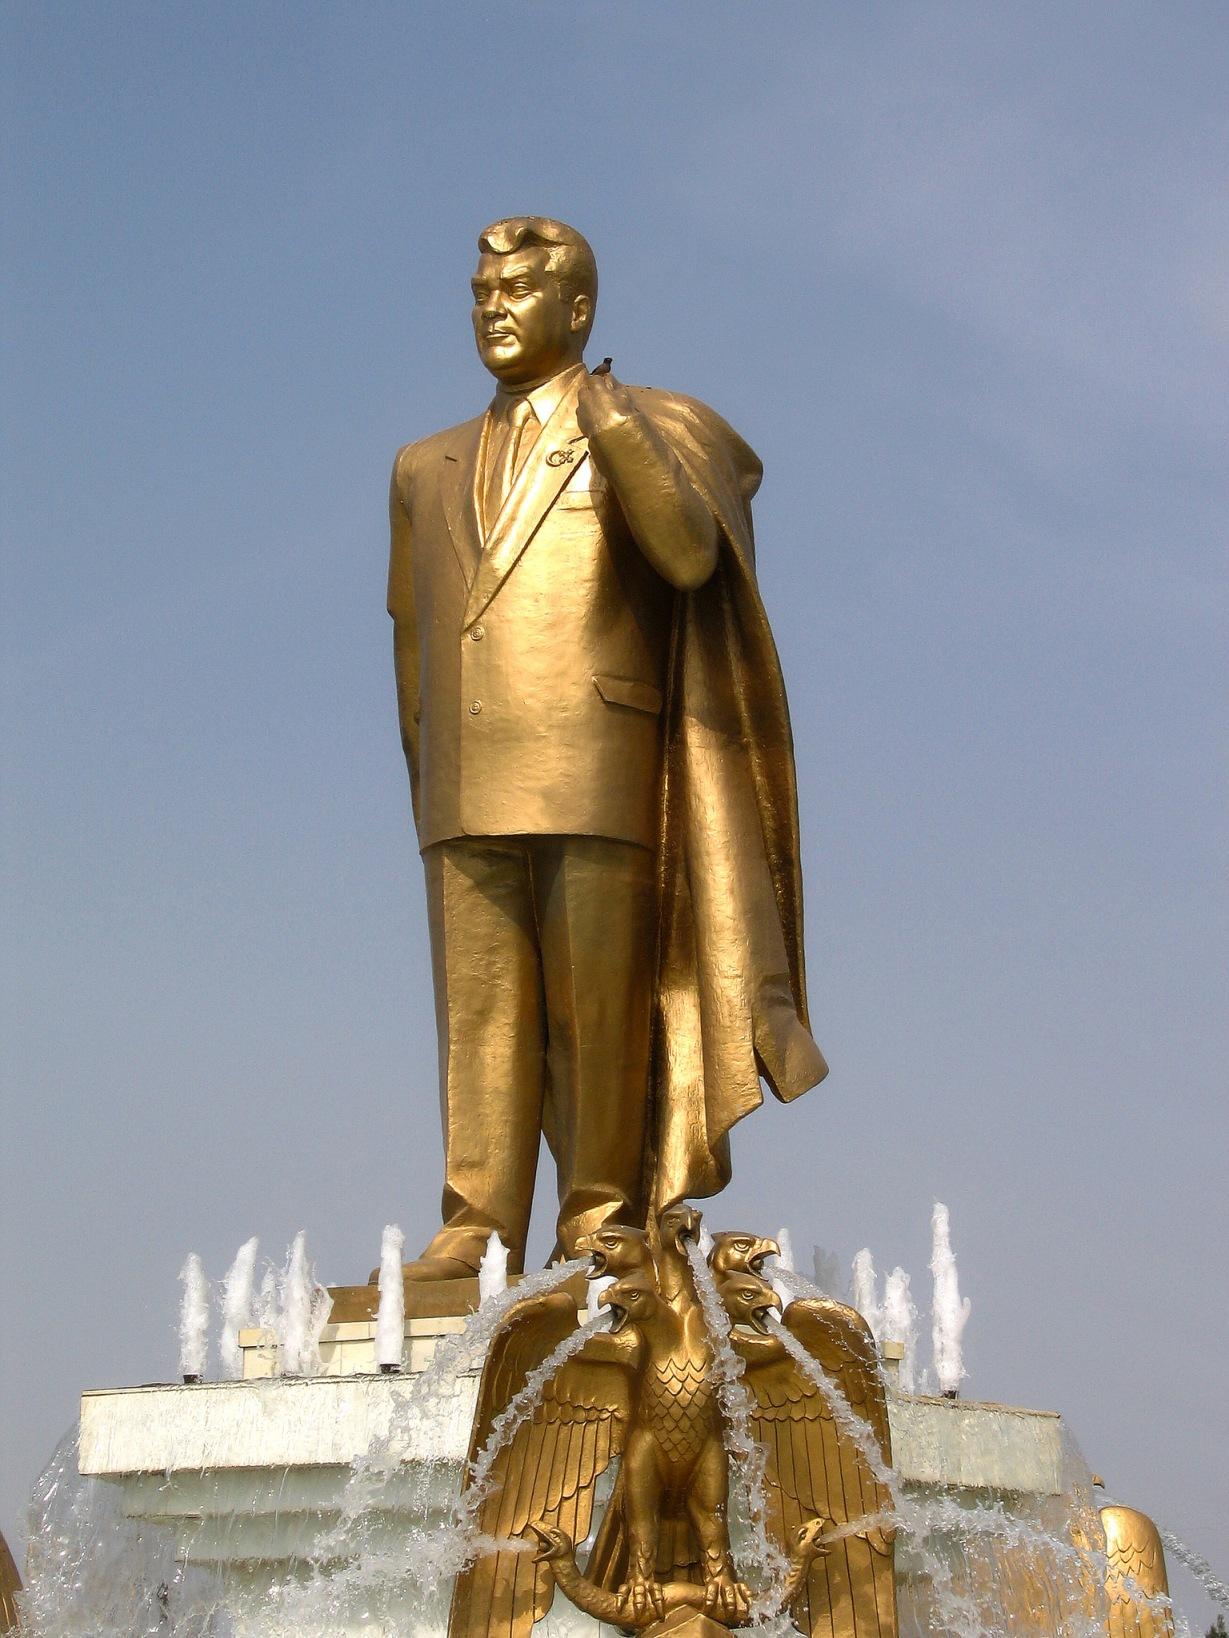 Statue Or Turkménistan Saparamourat Niyazov